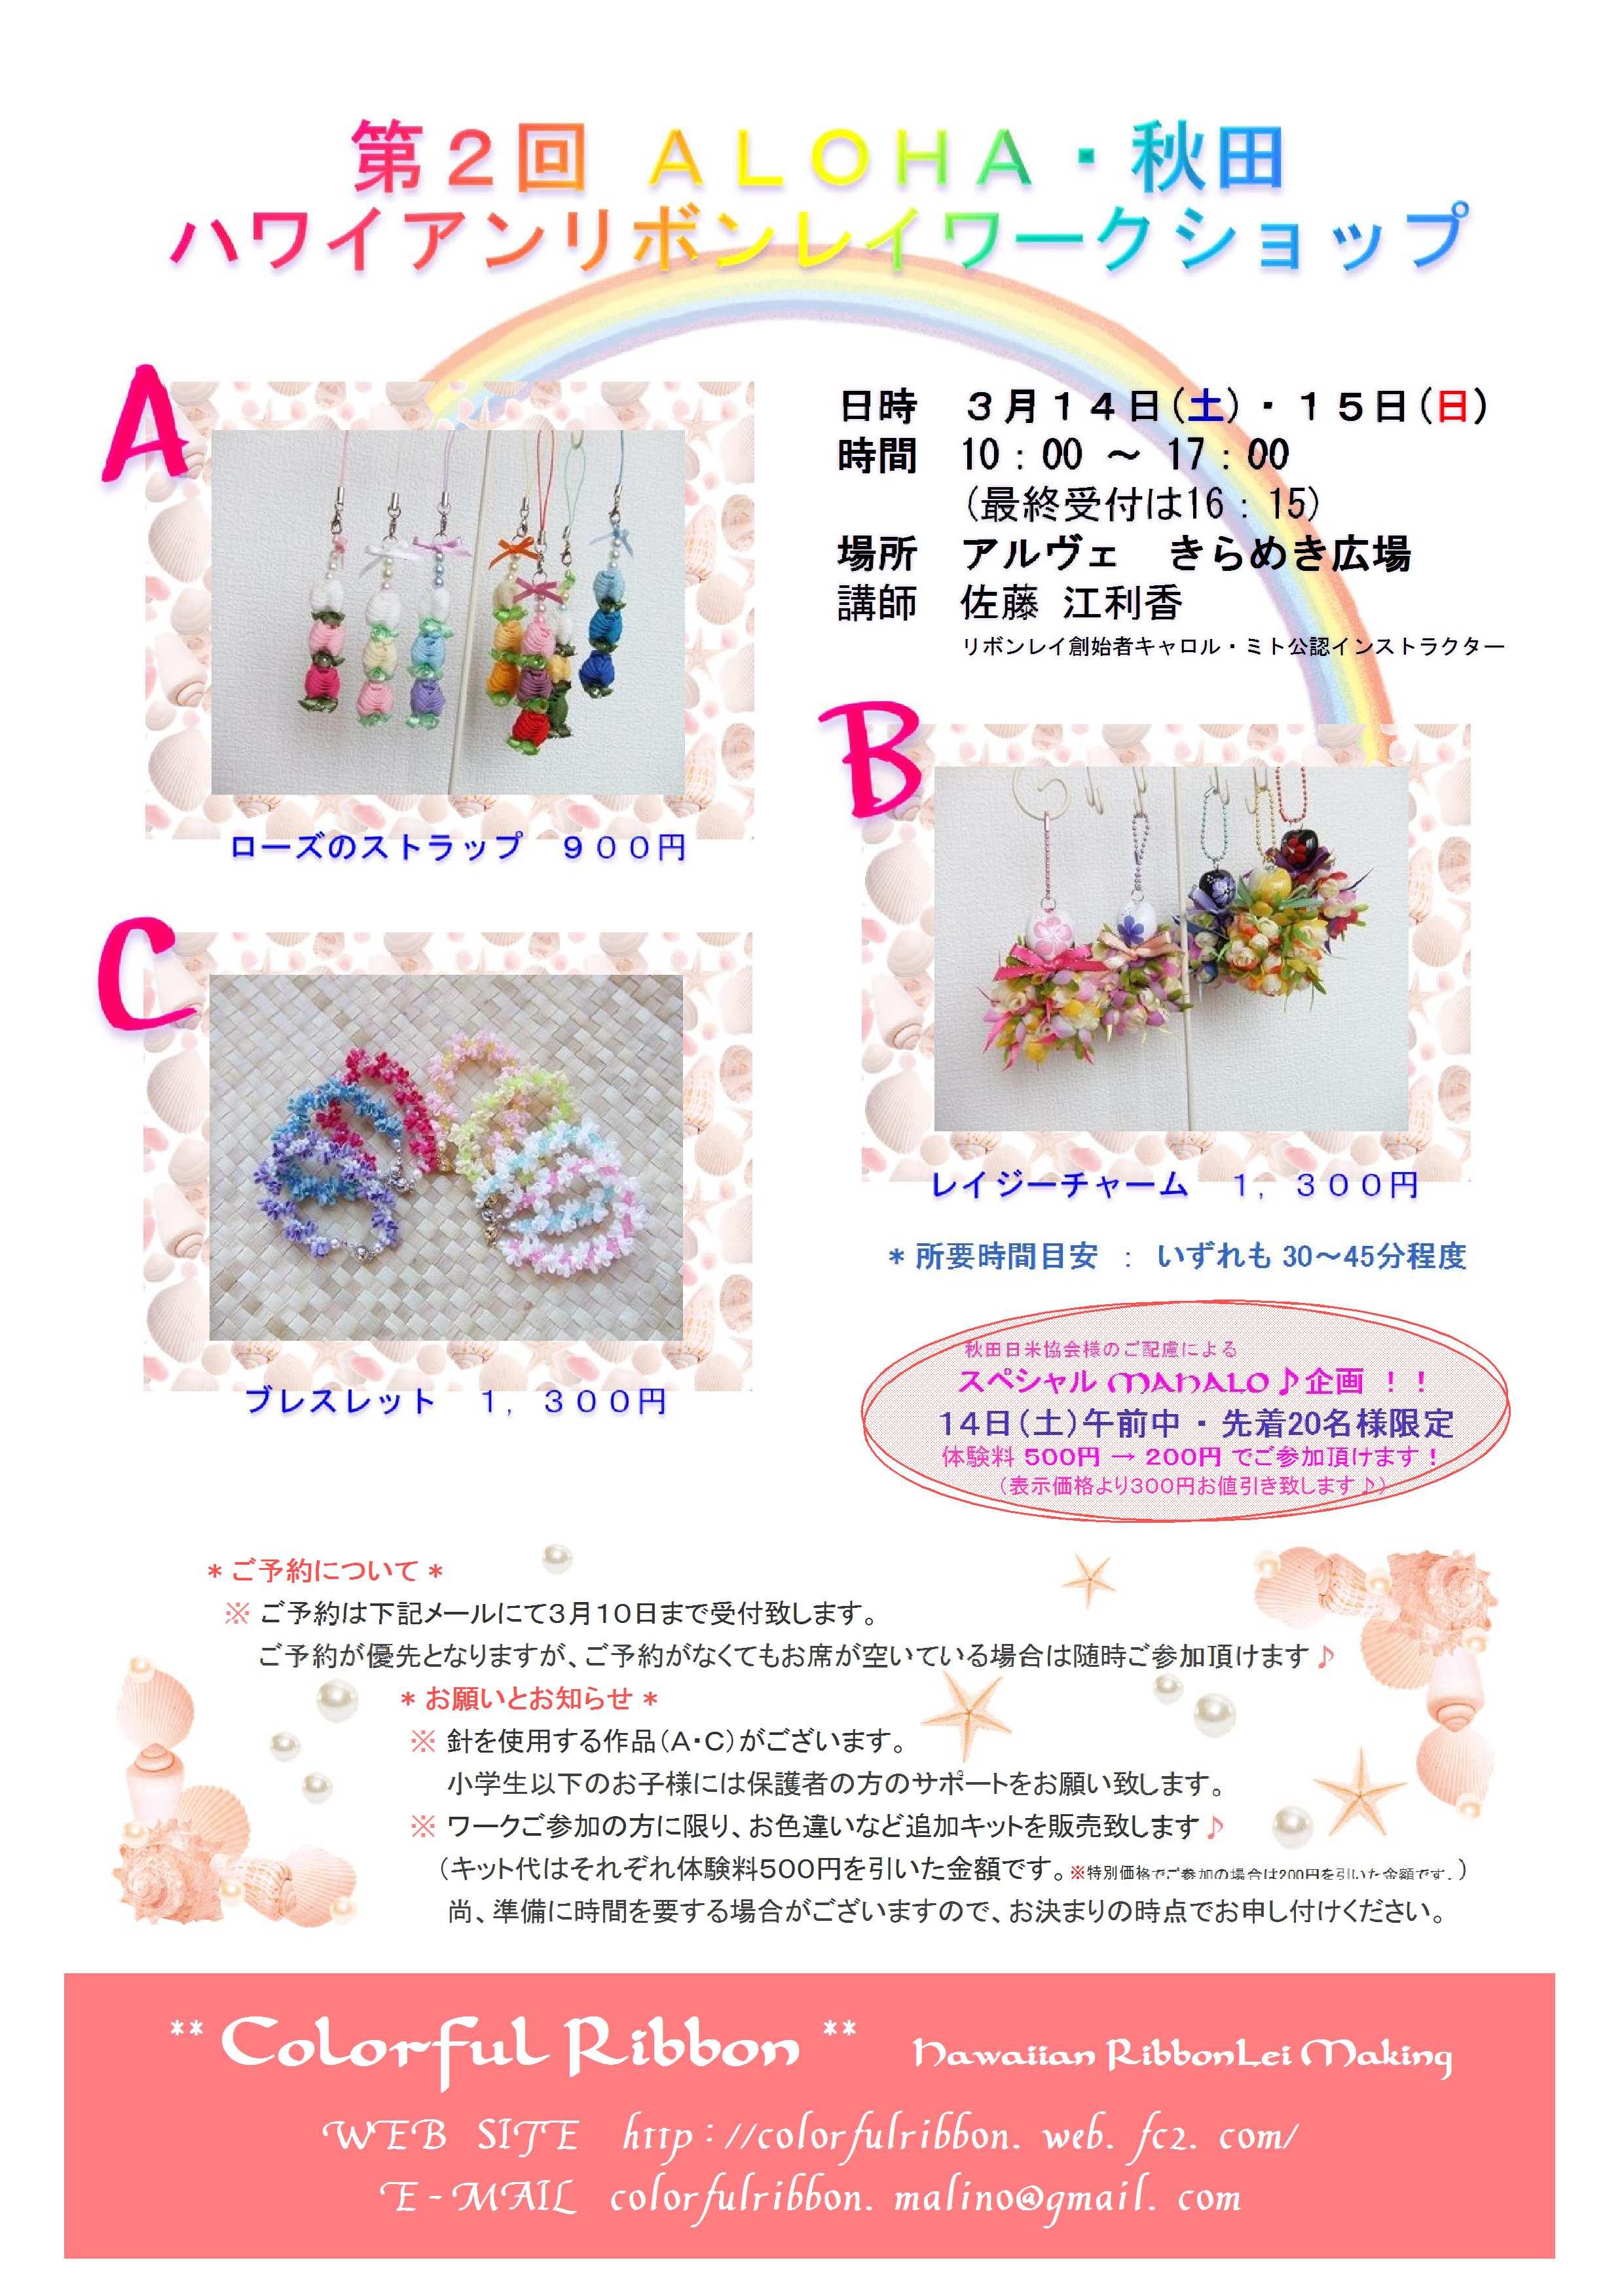 2015.03.14 alve alohaakita2